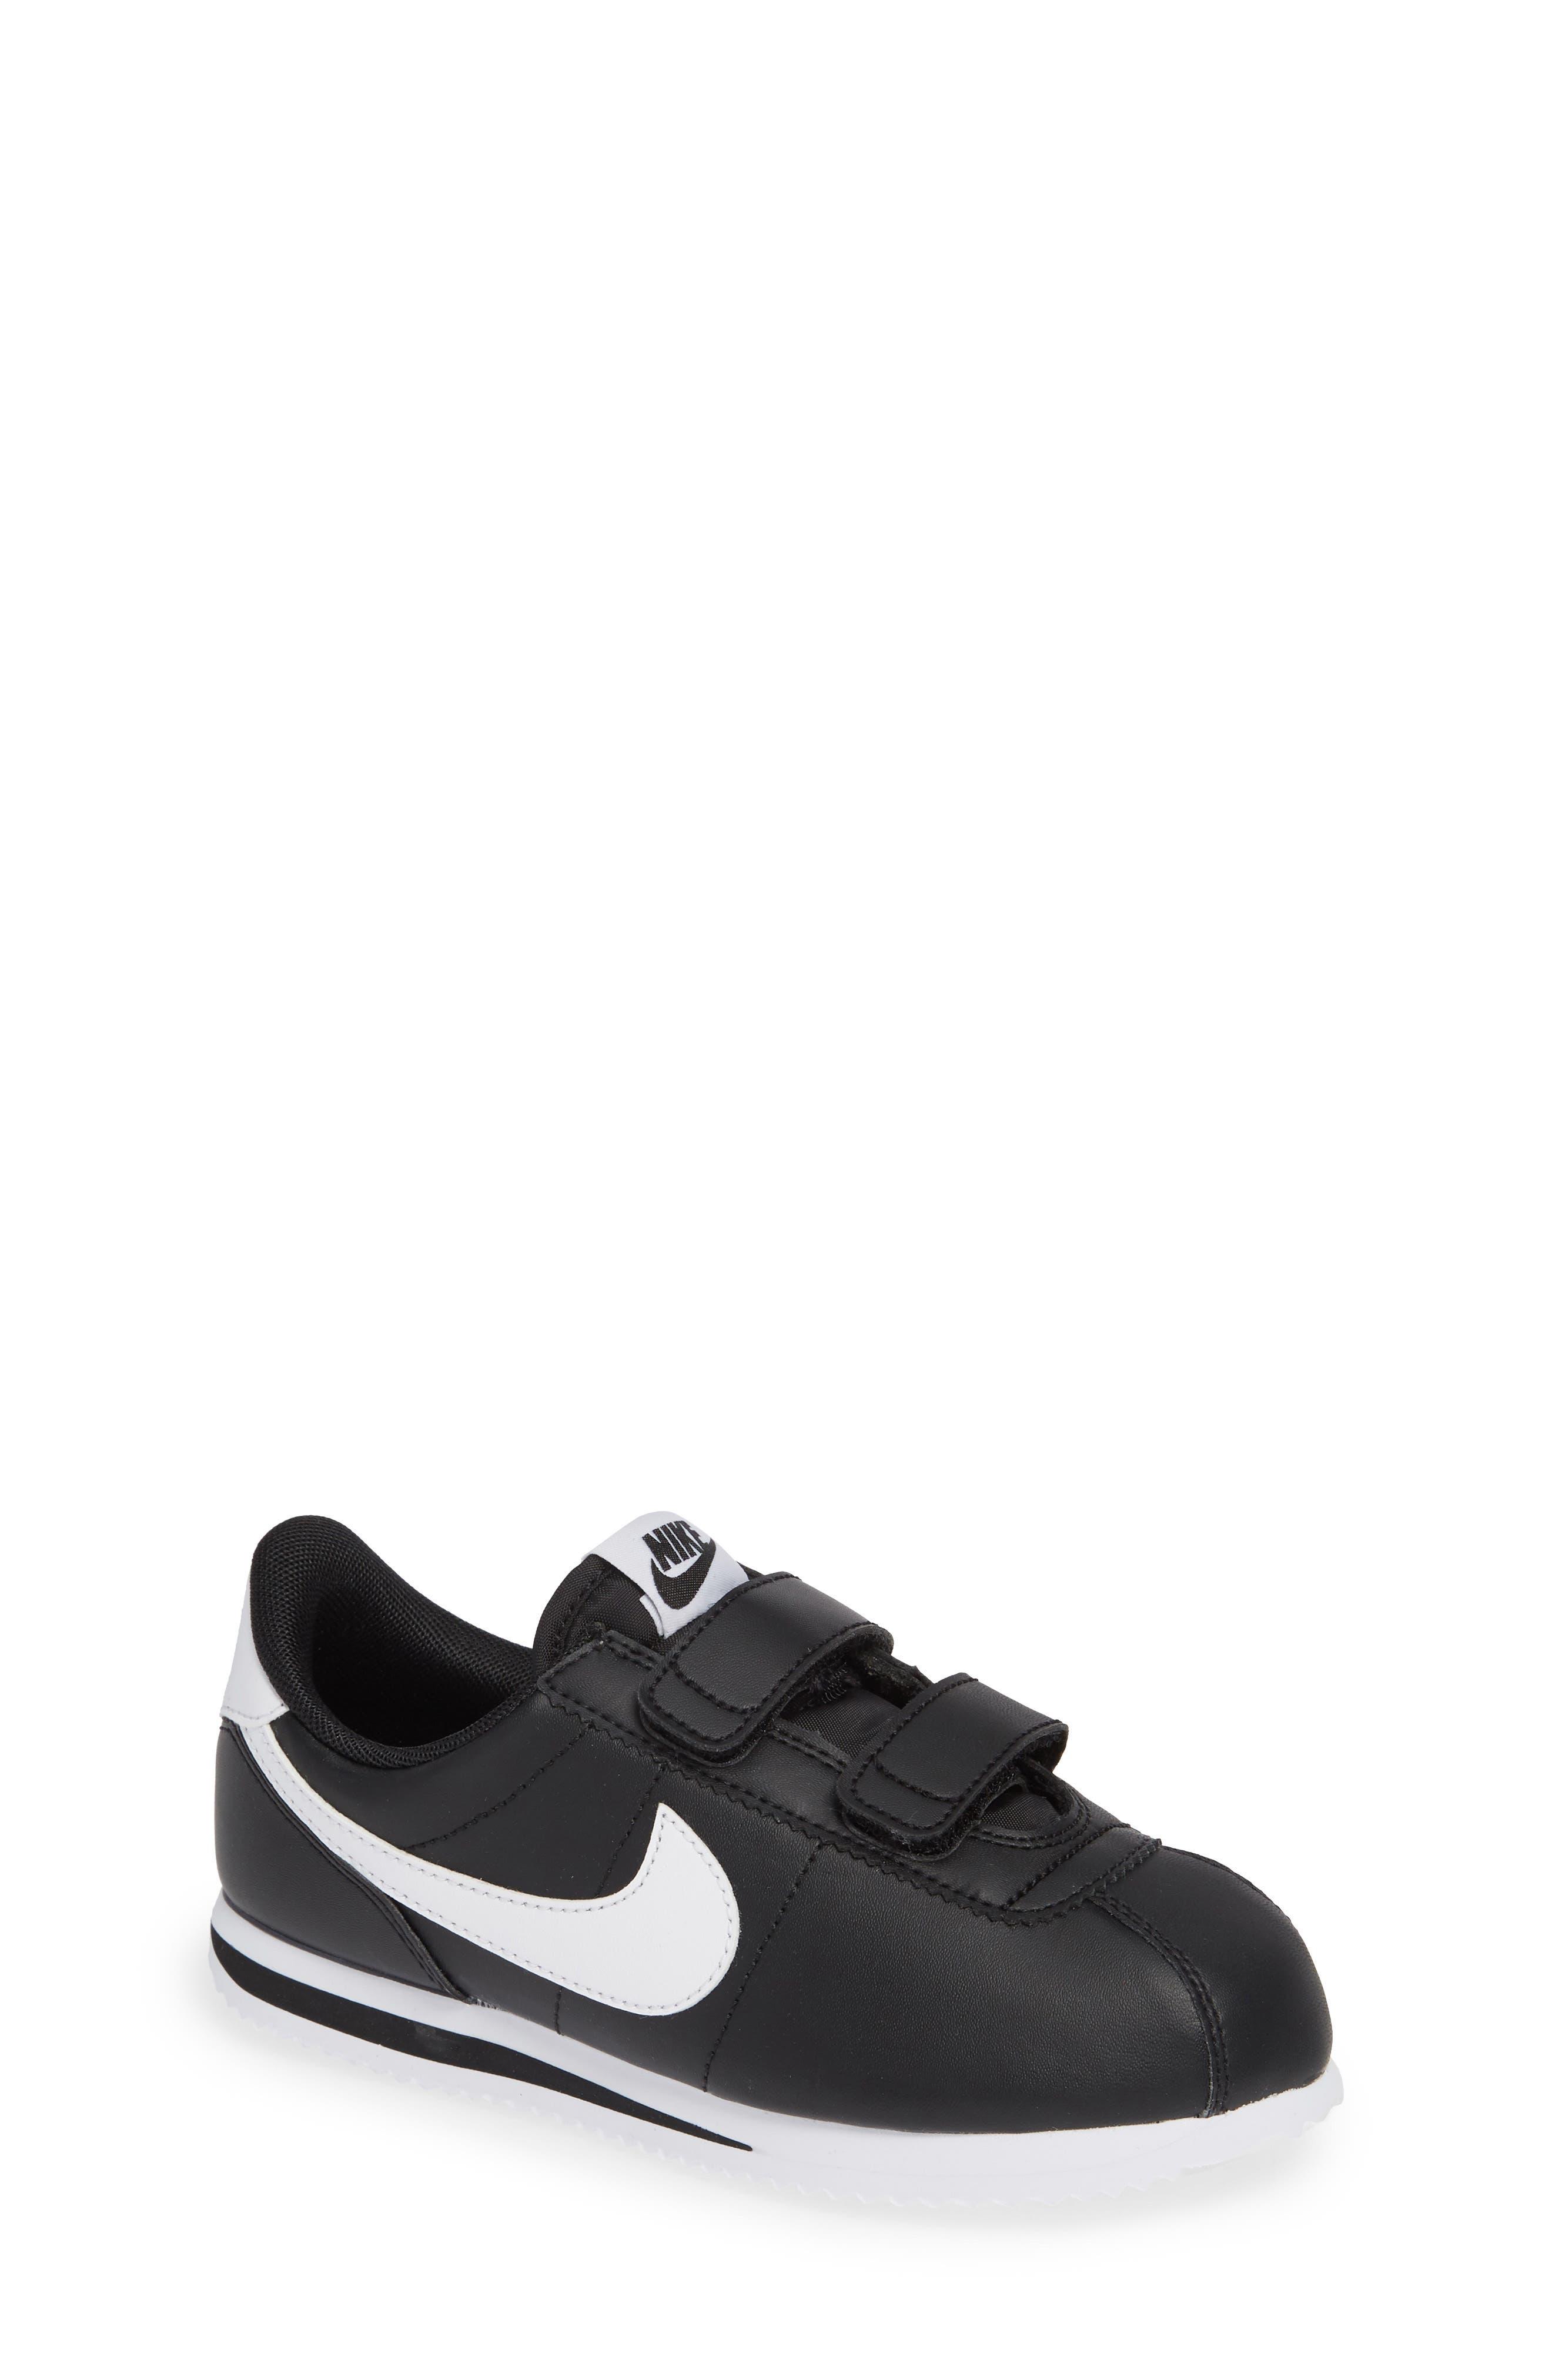 Cortez Basic SL Sneaker,                             Main thumbnail 1, color,                             Black/ White